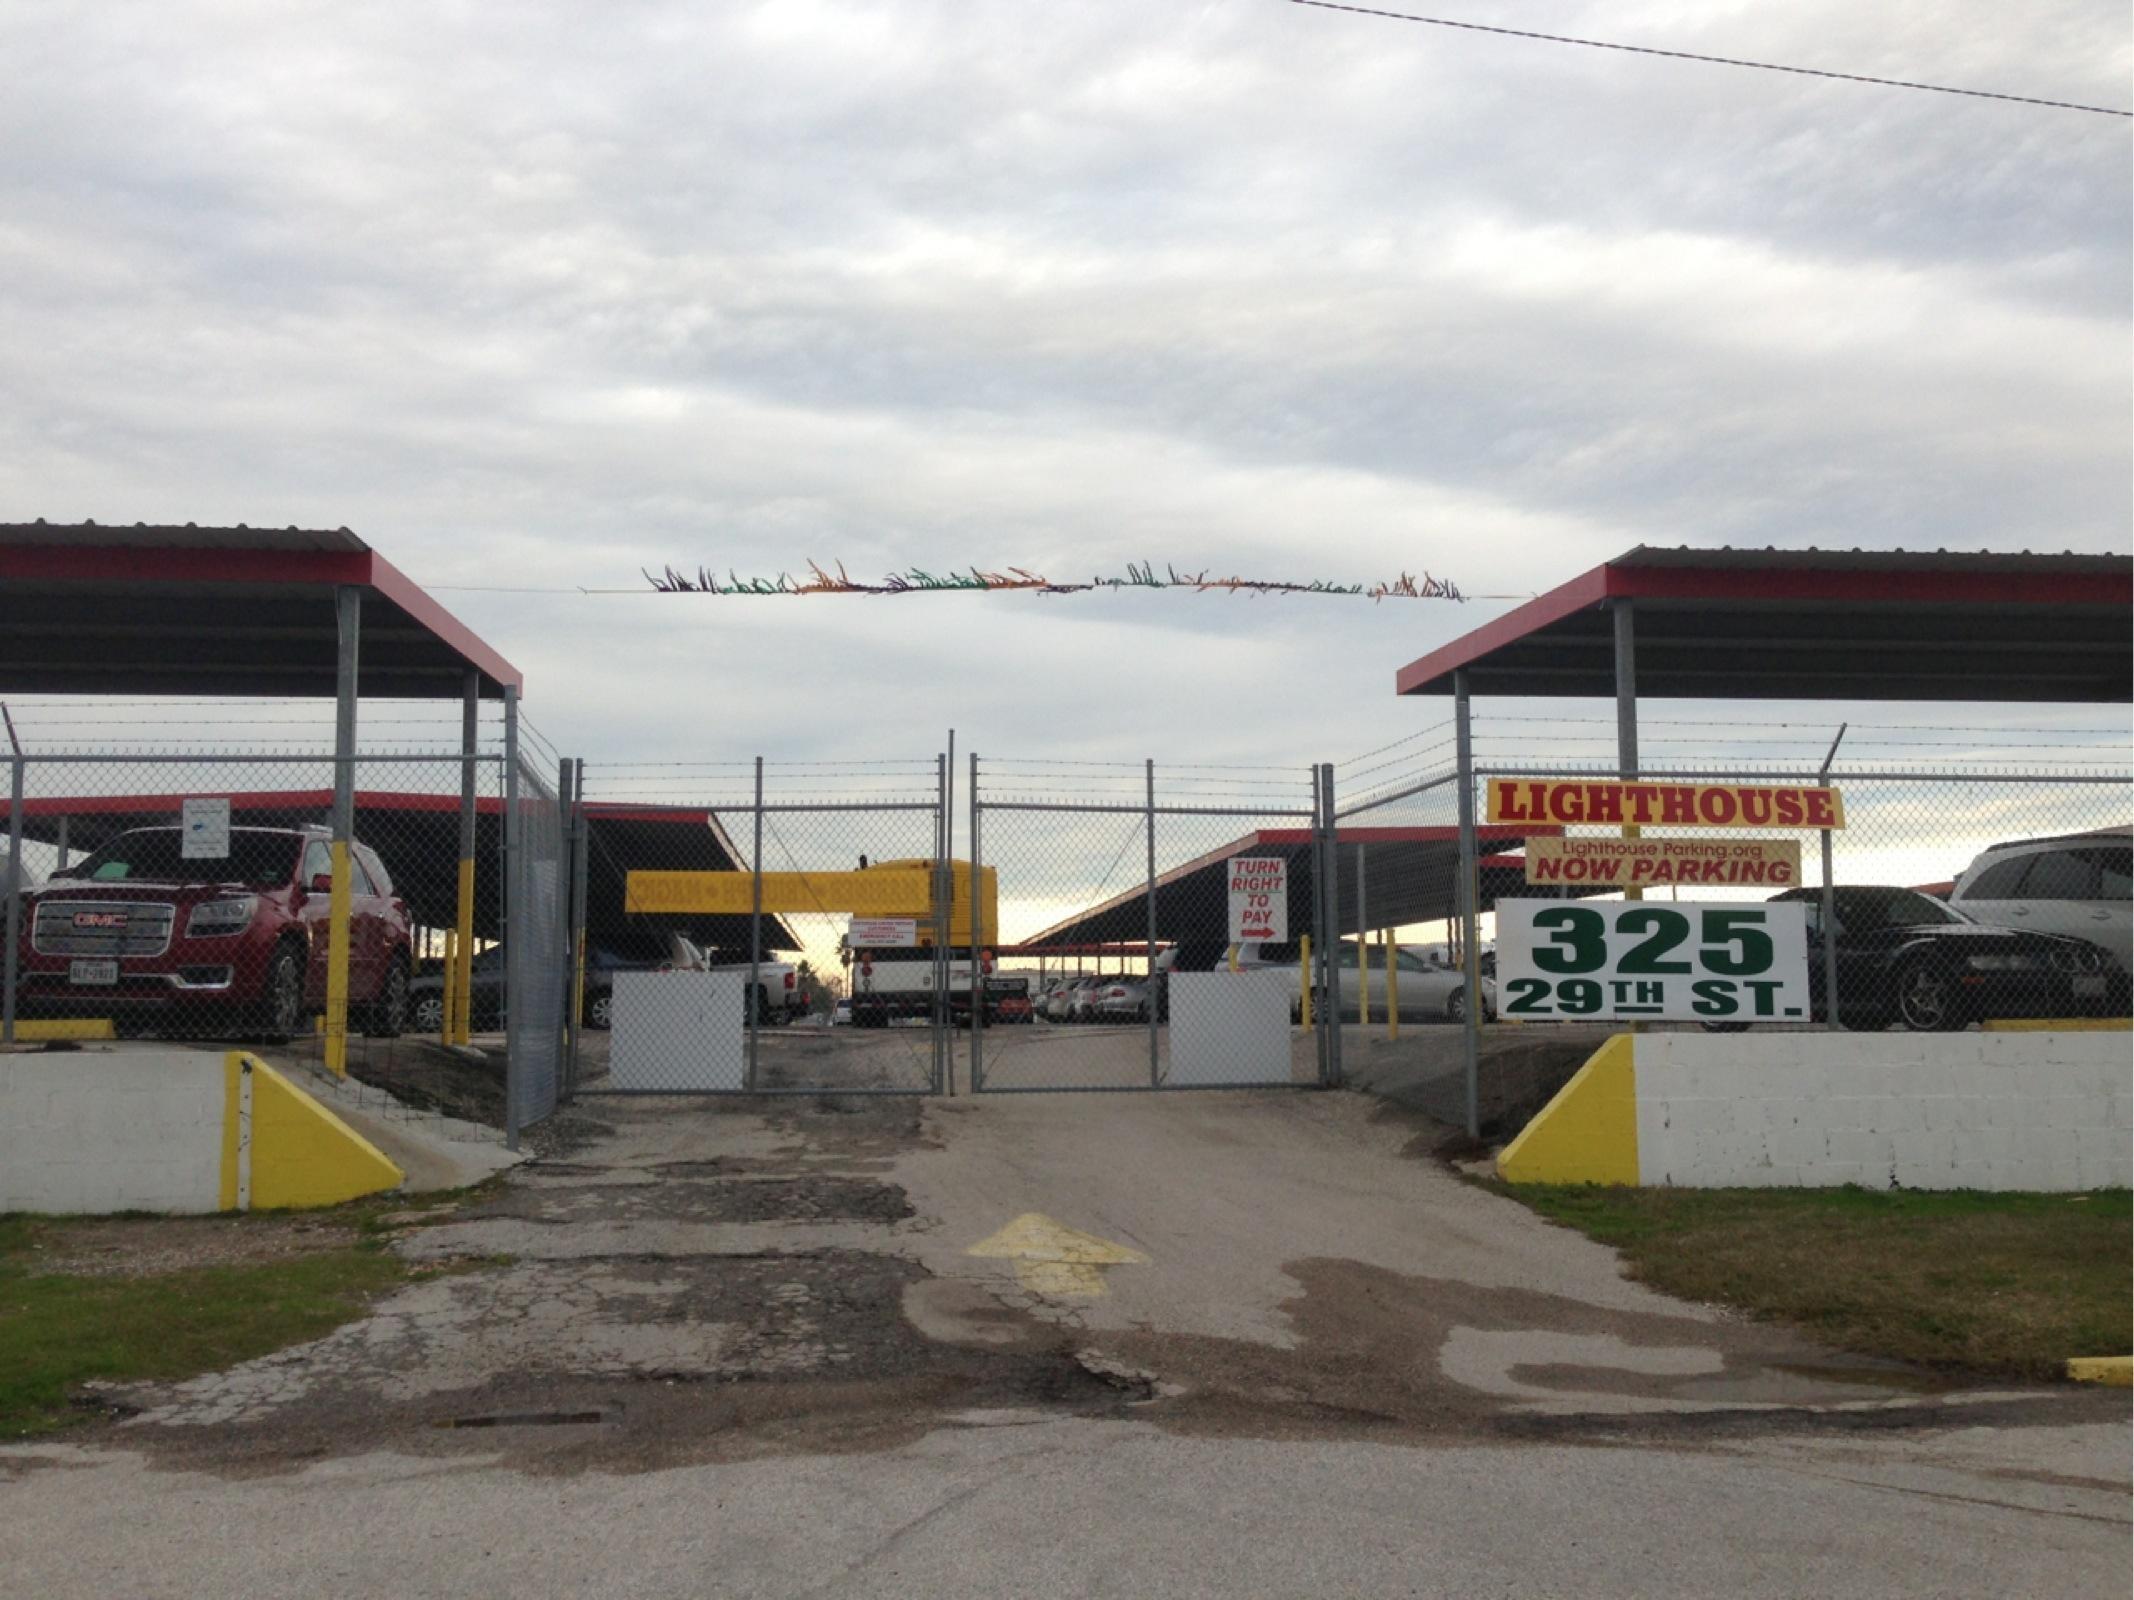 Lighthouse Cruise Parking  Parking In Galveston  ParkMe